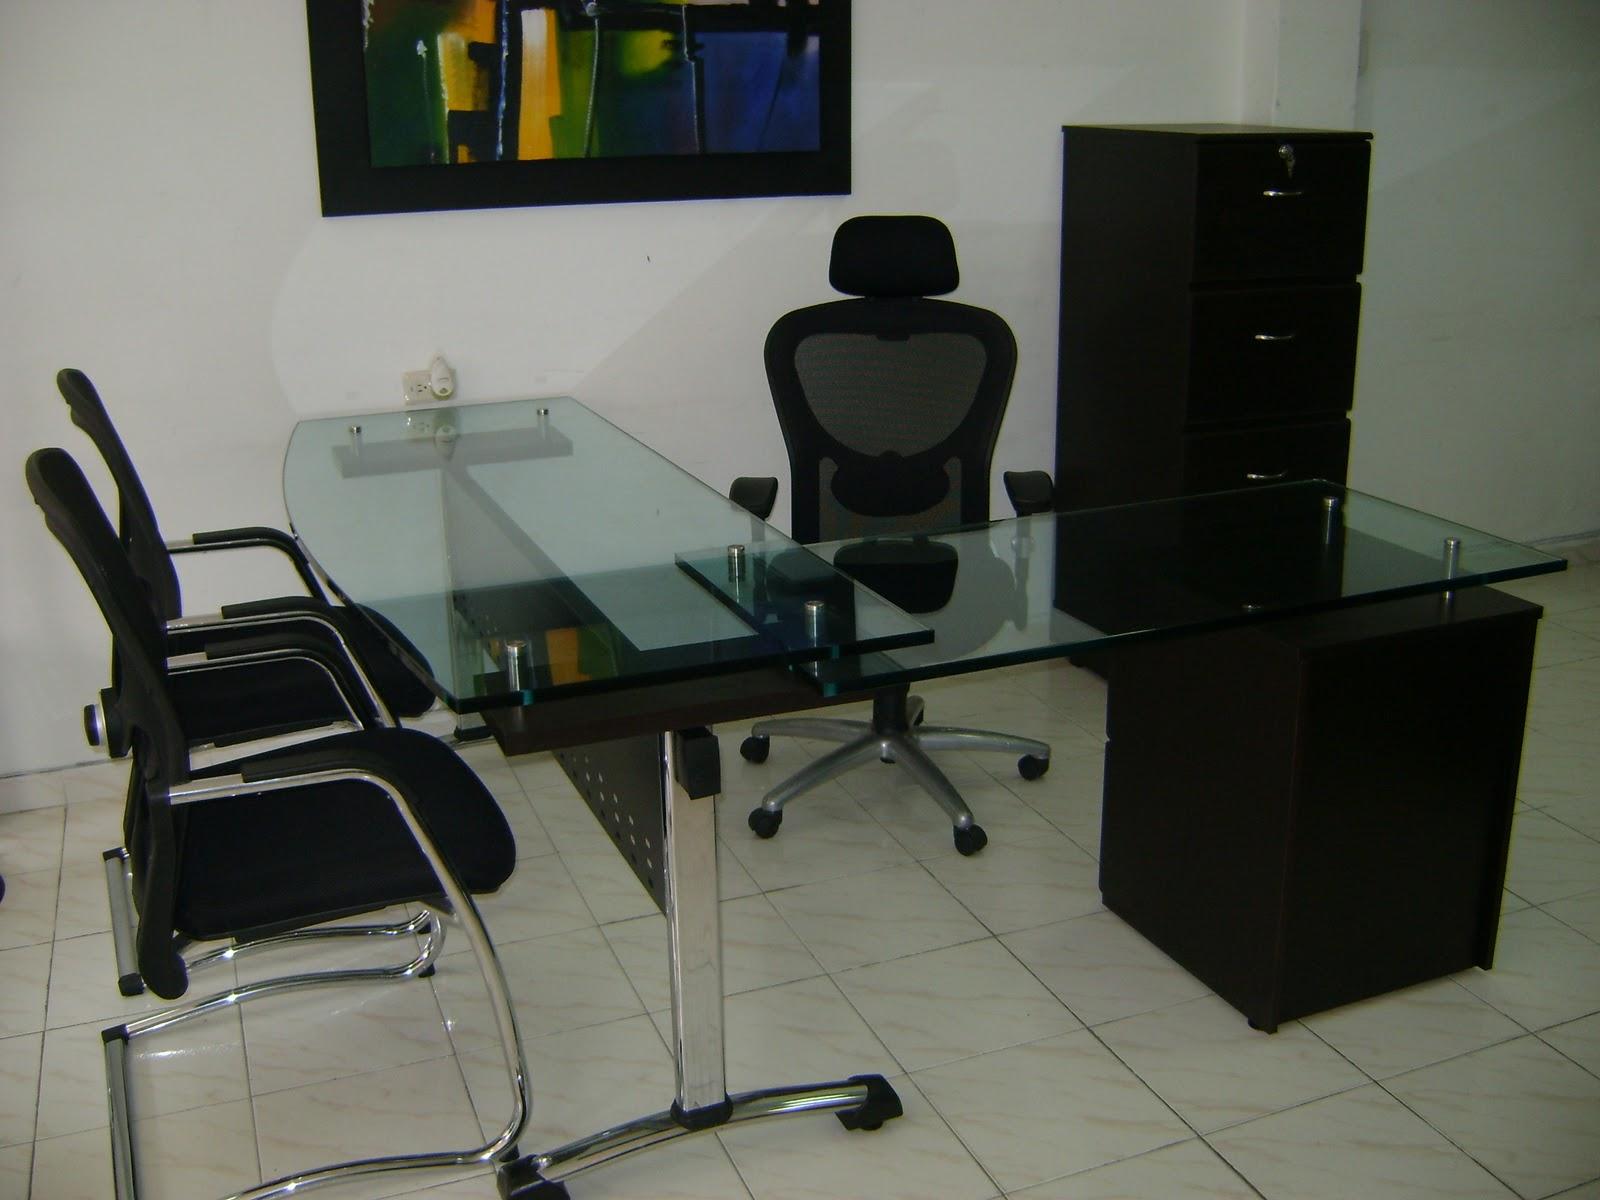 Muebles eduhel office dise o calidad escritorios en cristal - Disenos de escritorios ...